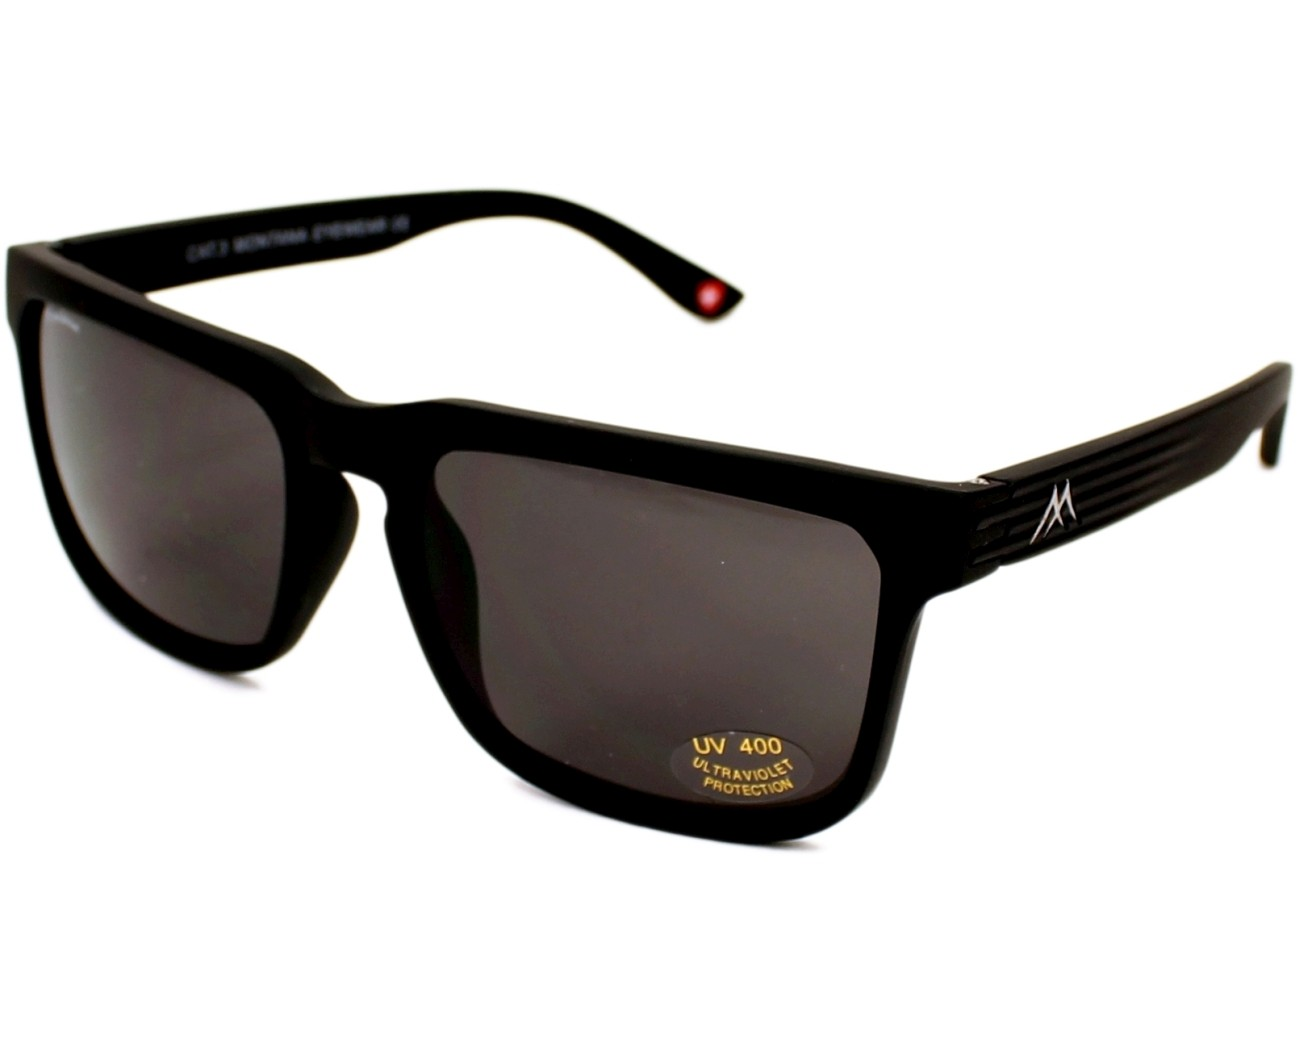 Montana Eyewear S26-Havanna wW5iP6zXp